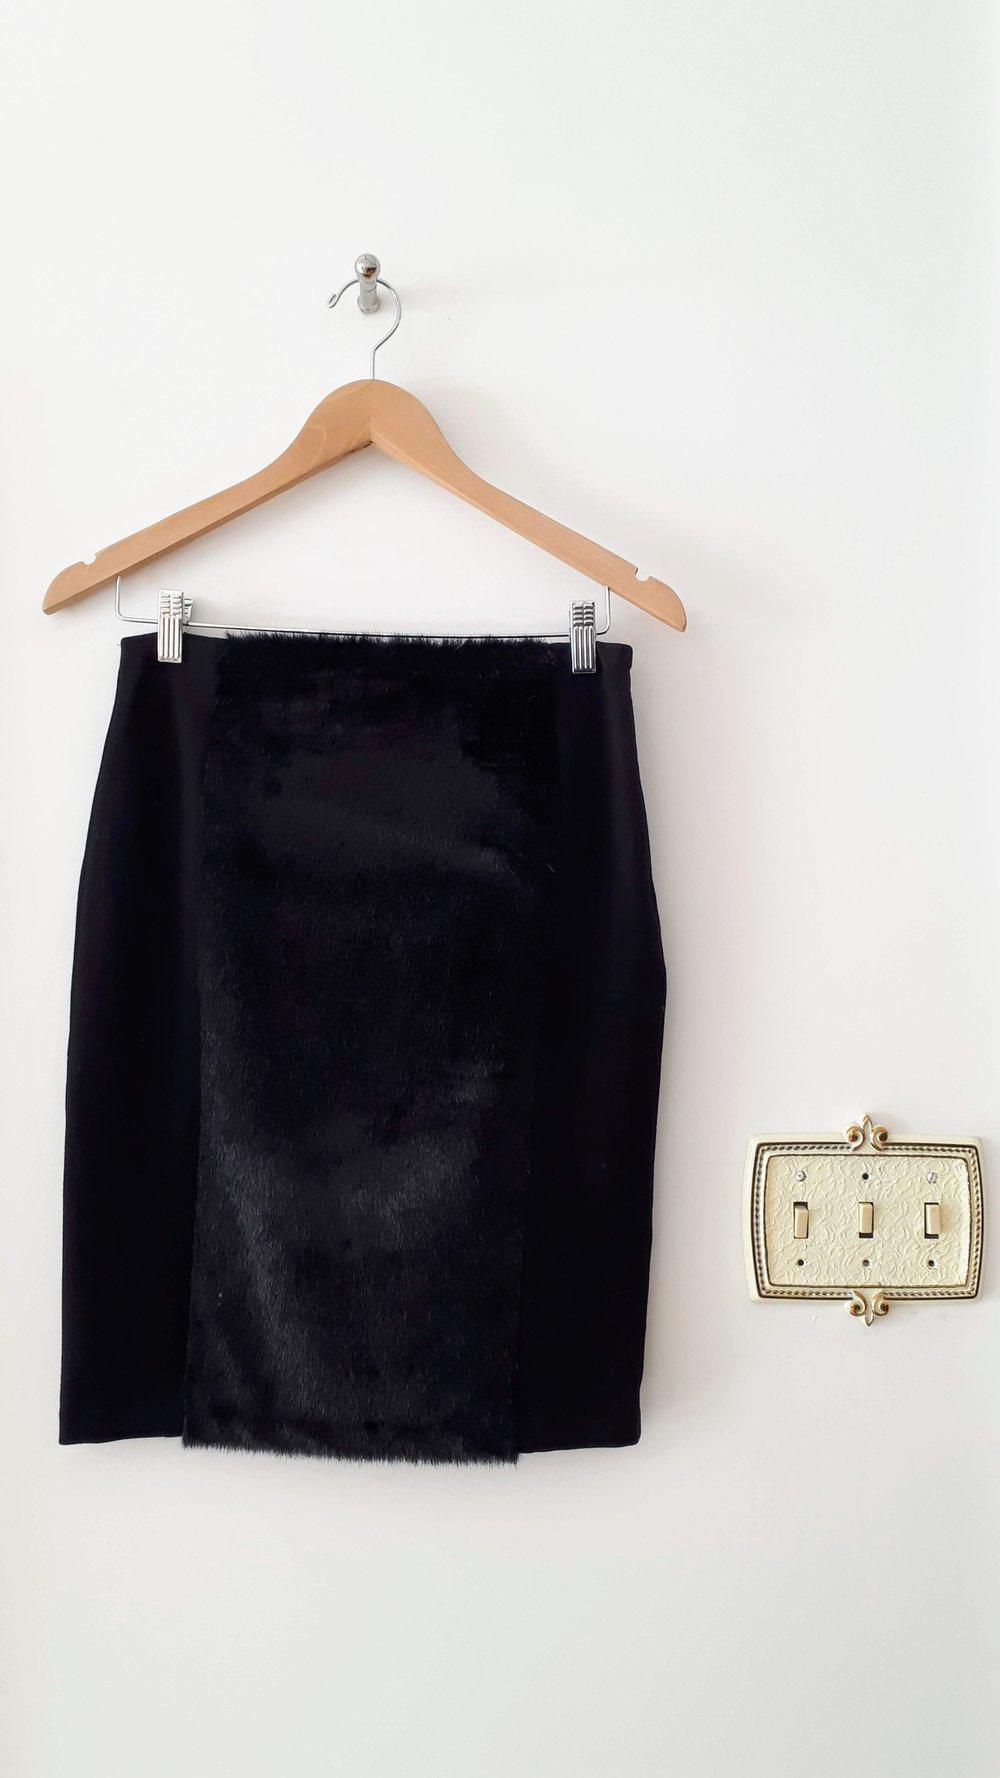 Jay Manuel skirt; Size 4, $24